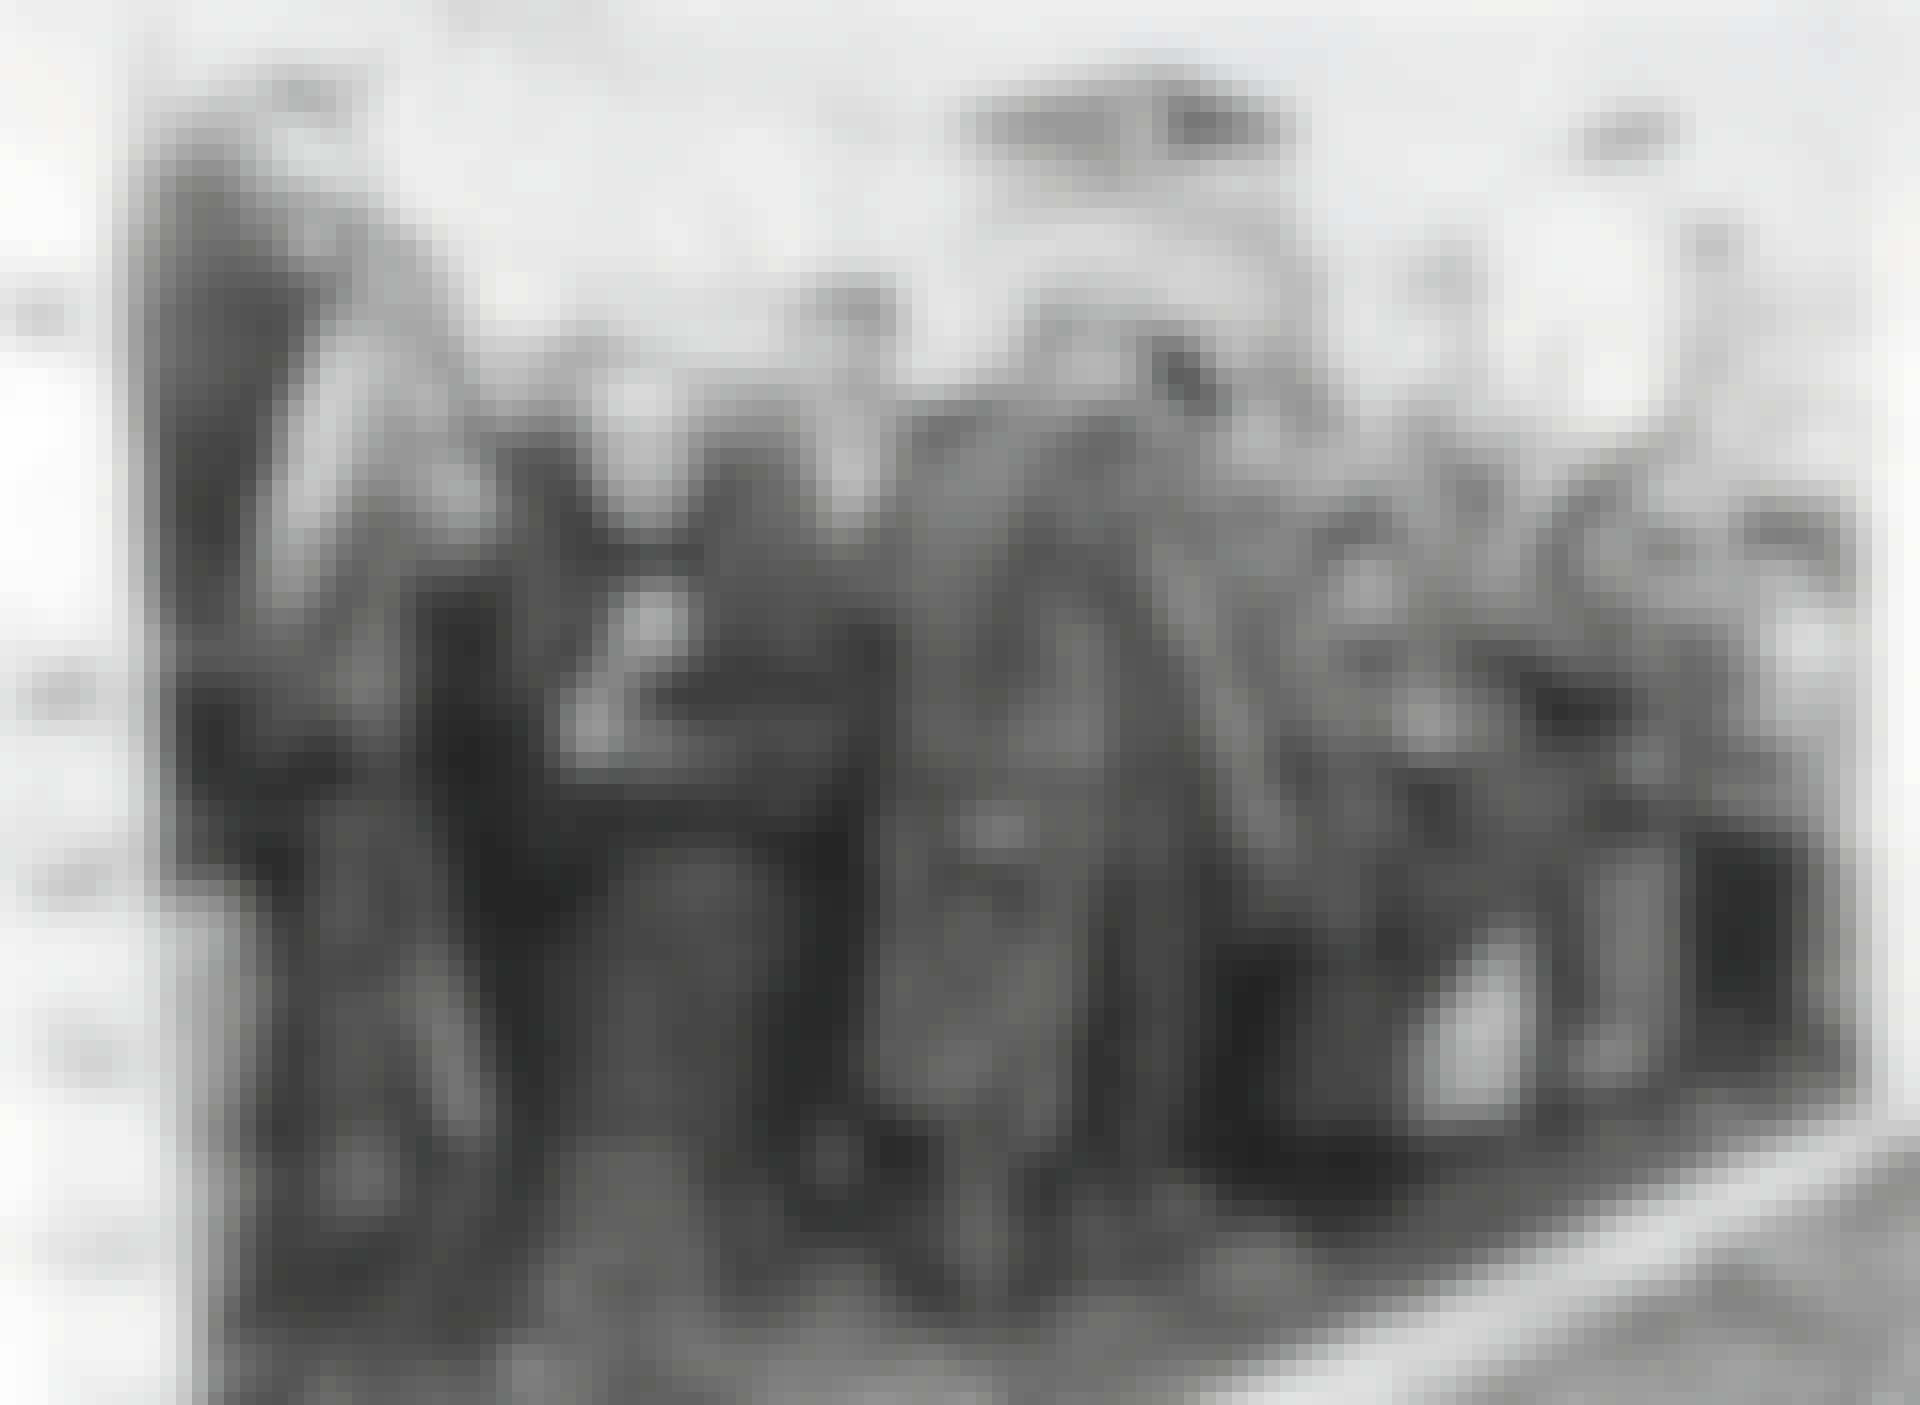 Russerne fant Auschwitz-fanger